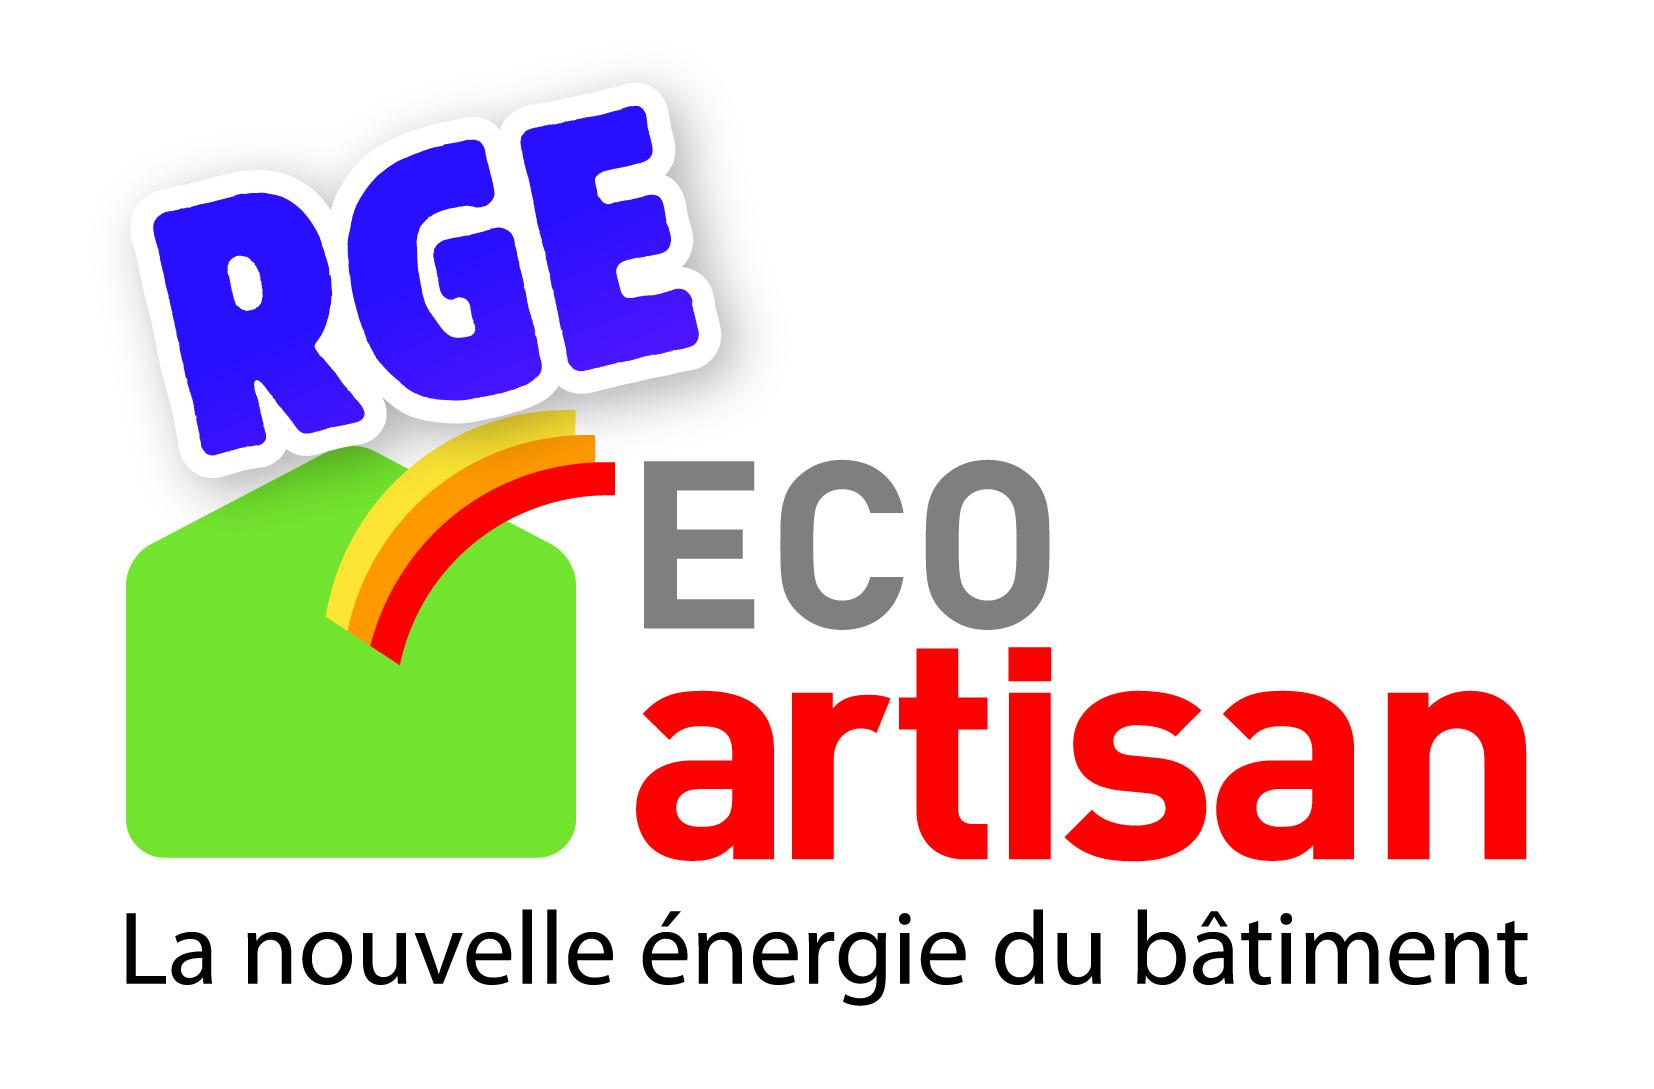 http://www.habitatdurable-franchecomte.com/wp-content/uploads/2014/11/LOGO_ECO_ARTISAN_RGE.jpg